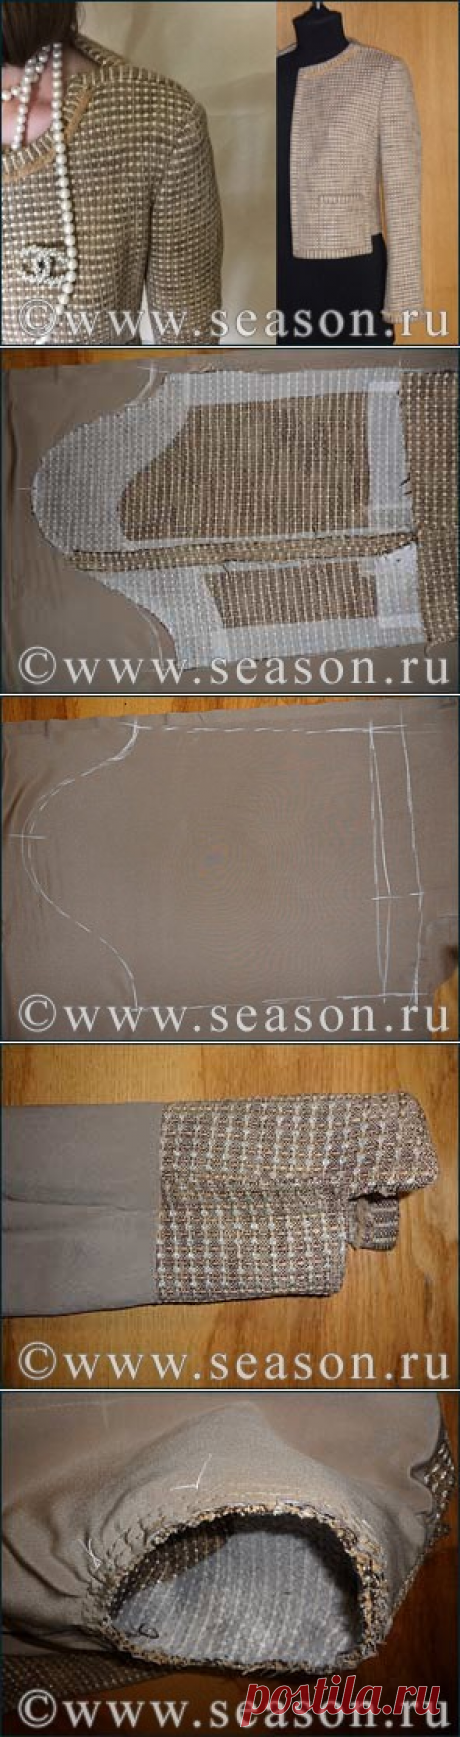 "Club of fans of sewing \""Season\"": Jacket sleeve lining"